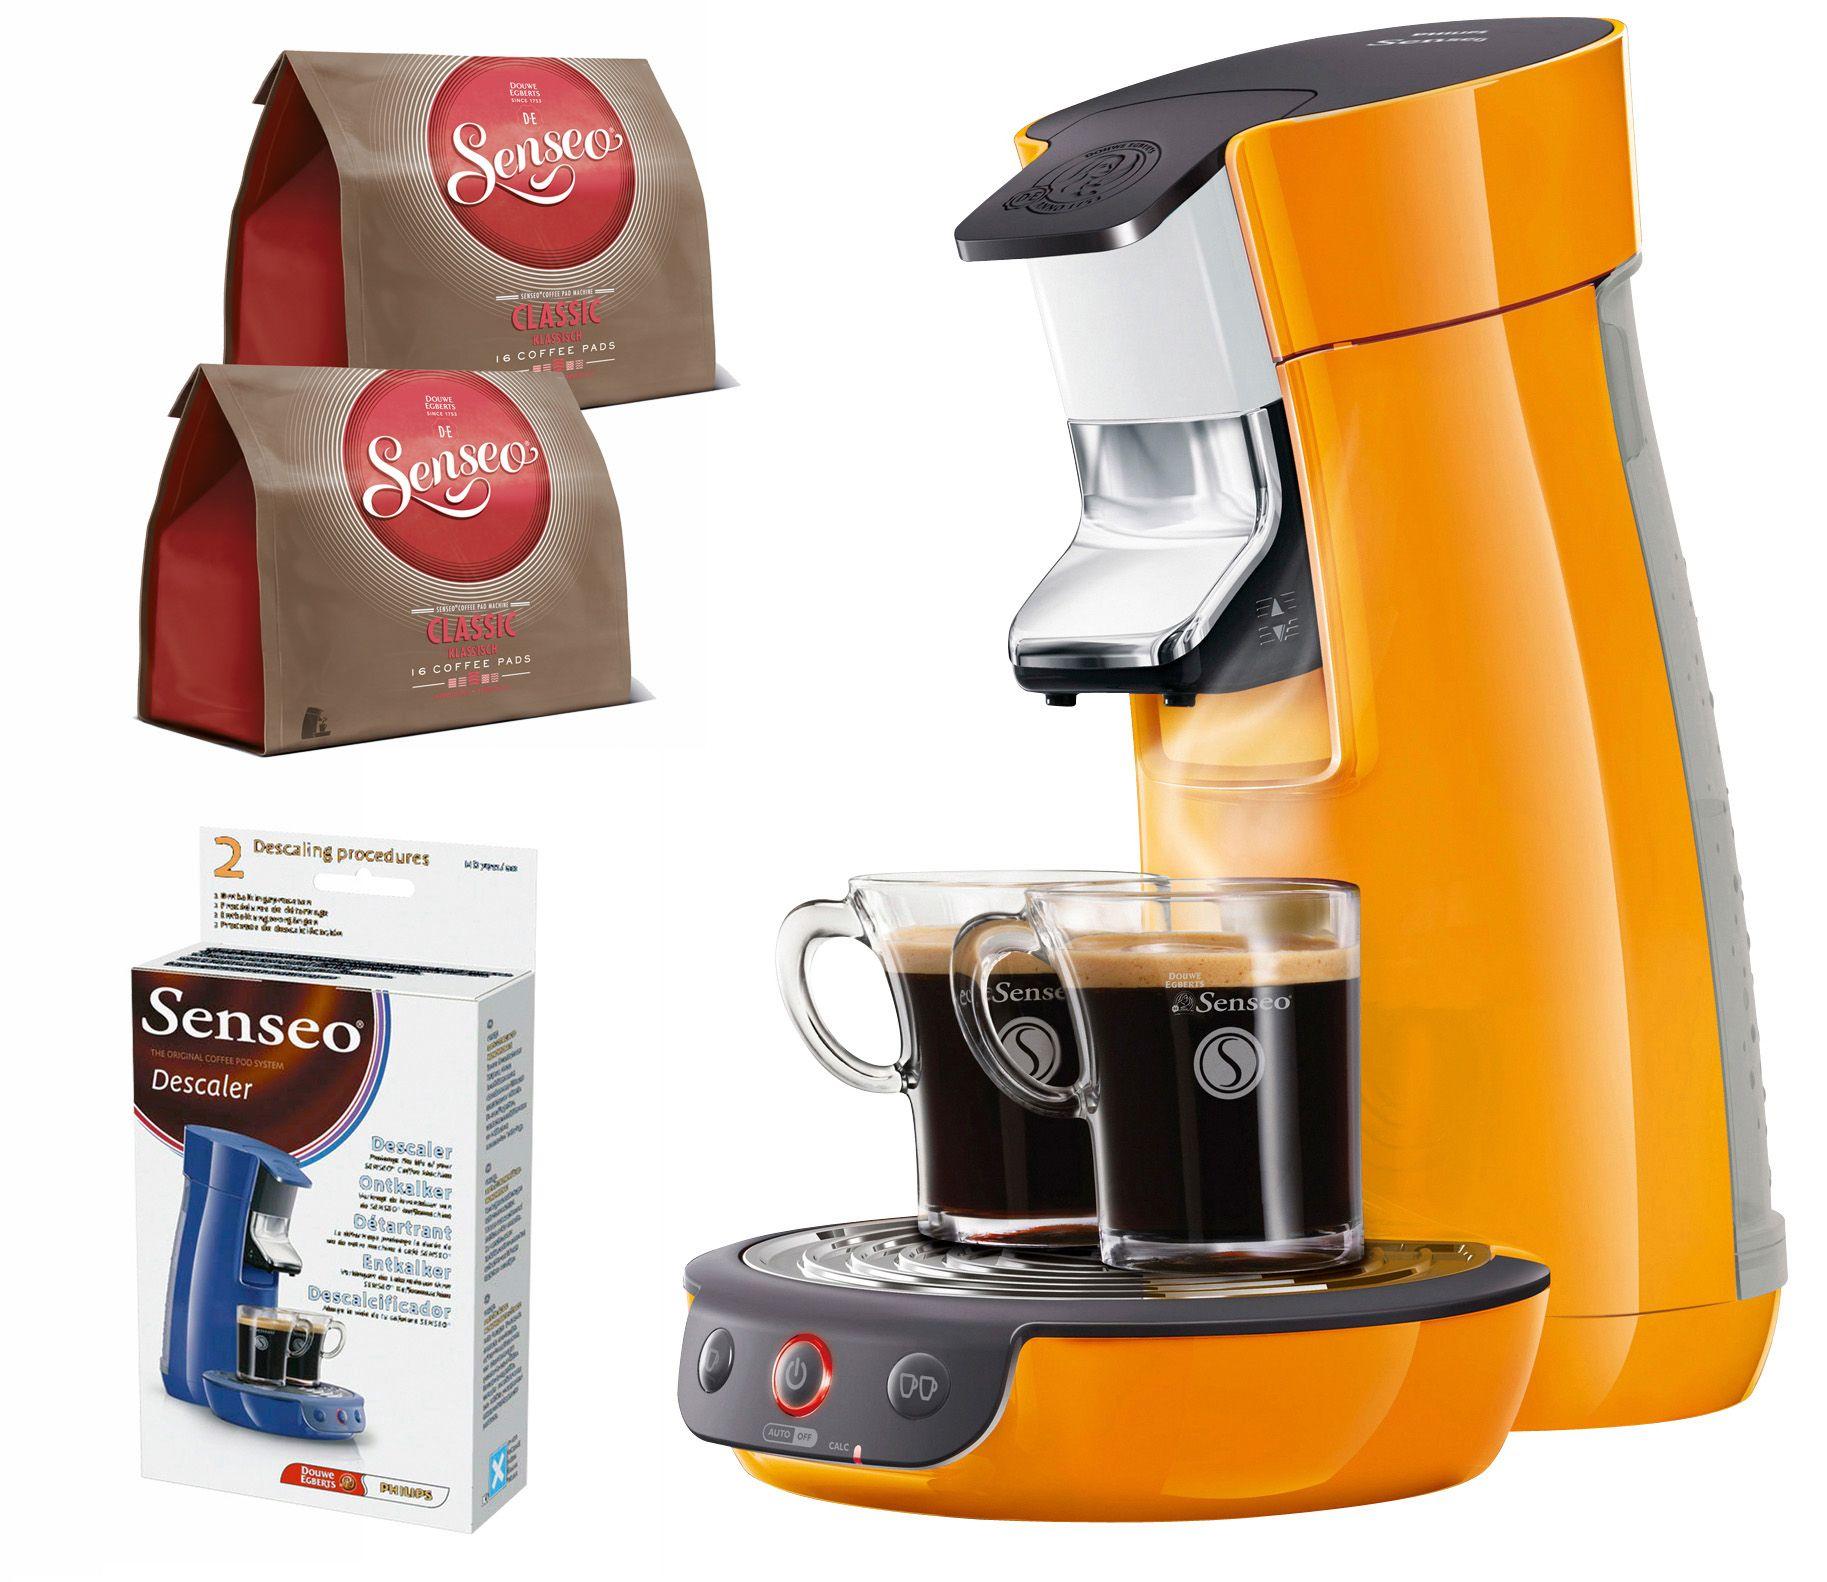 philips senseo kaffeepadmaschine hd7825 viva caf inkl. Black Bedroom Furniture Sets. Home Design Ideas